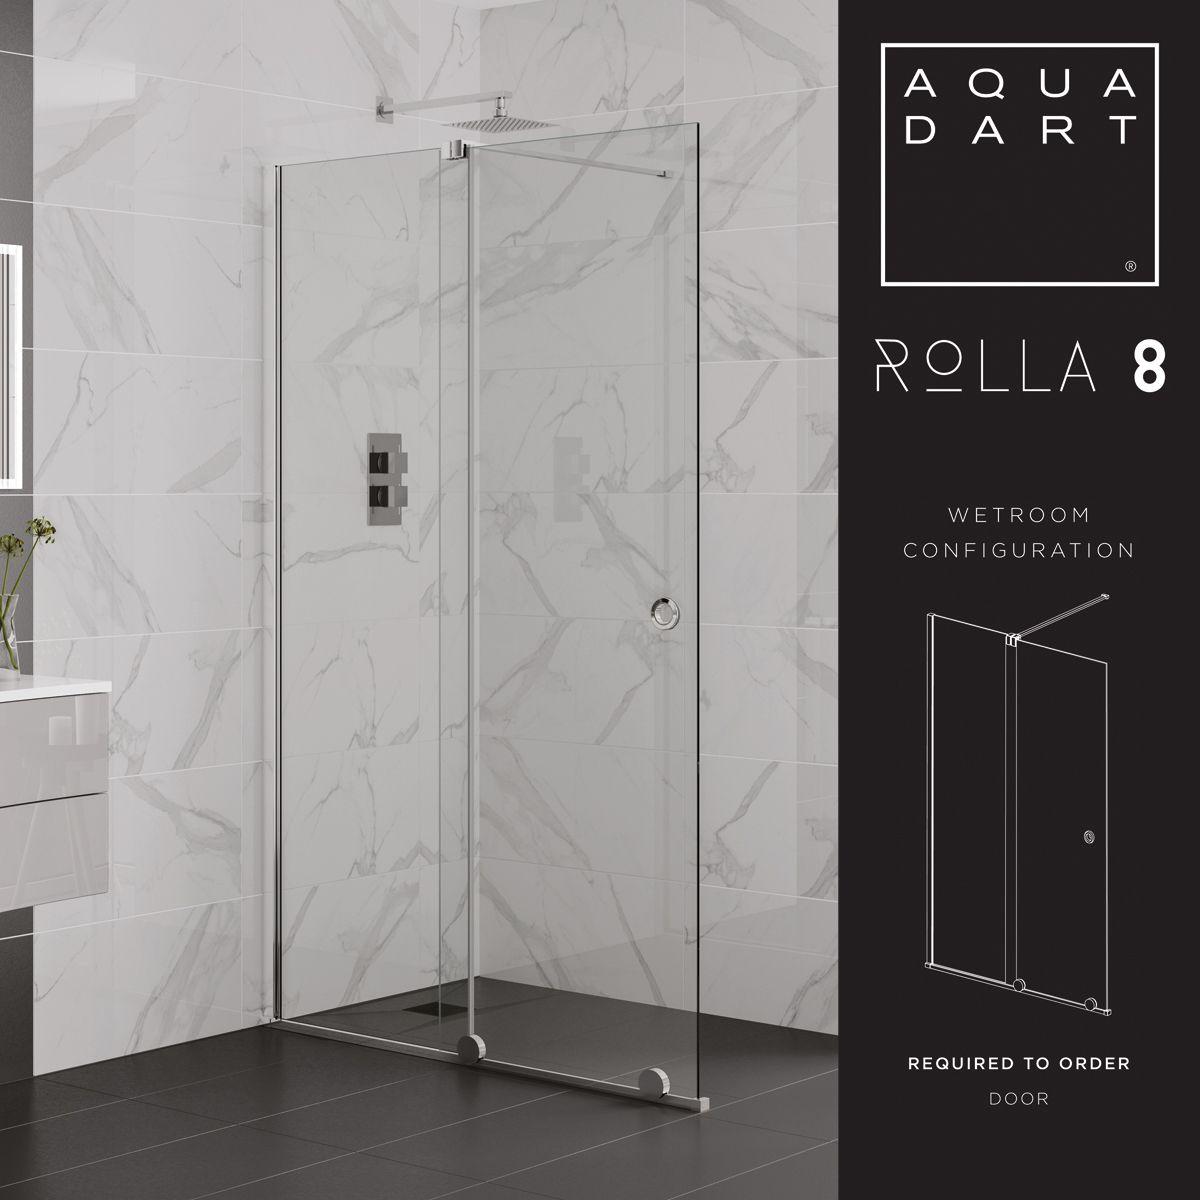 Aquadart Rolla 8 Black Sliding Shower Enclosure Wet Room Configuration